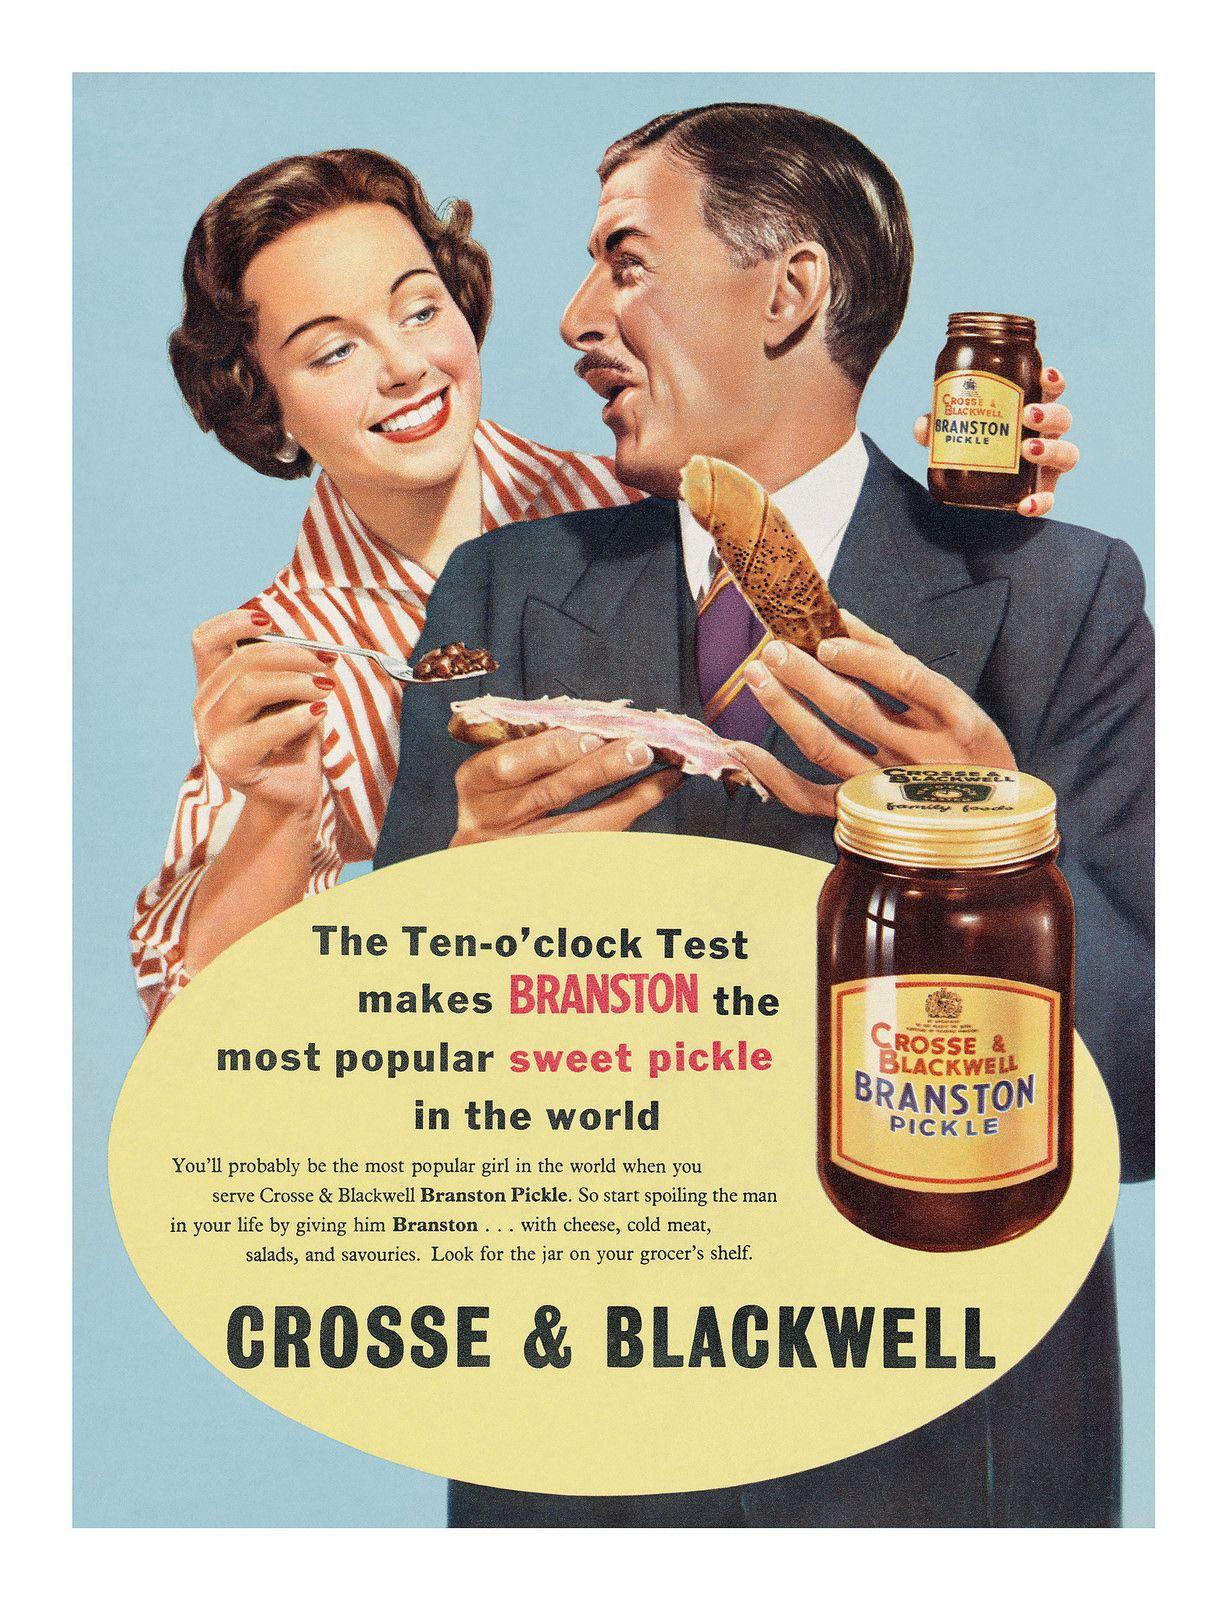 1957 Crosse & Blackwell Branston Pickle ad Branston